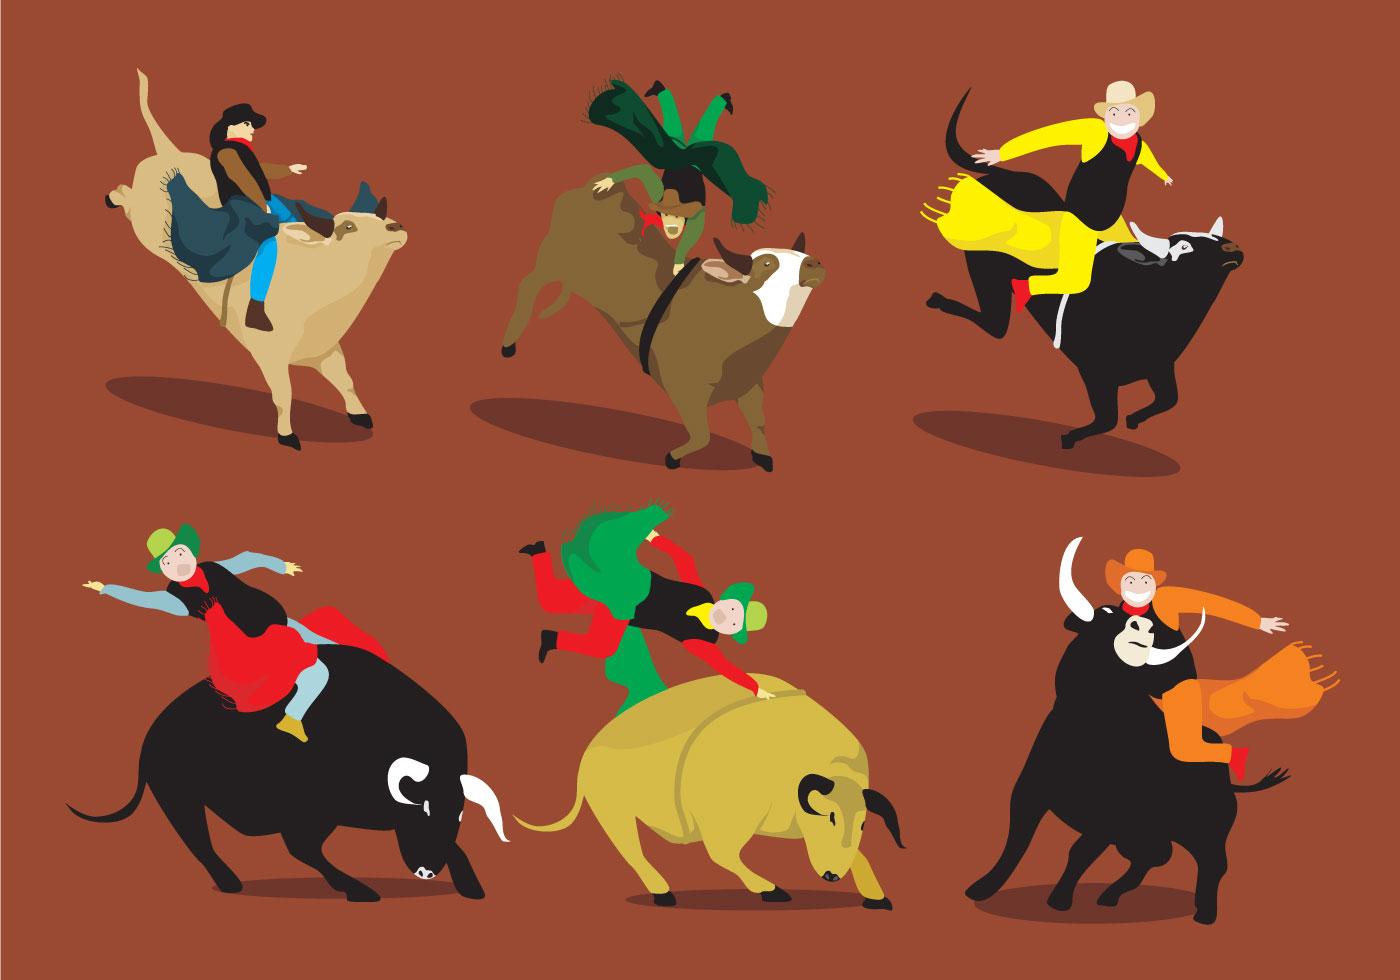 Fun Bull Rider Vectors - Download Free Vector Art, Stock ...